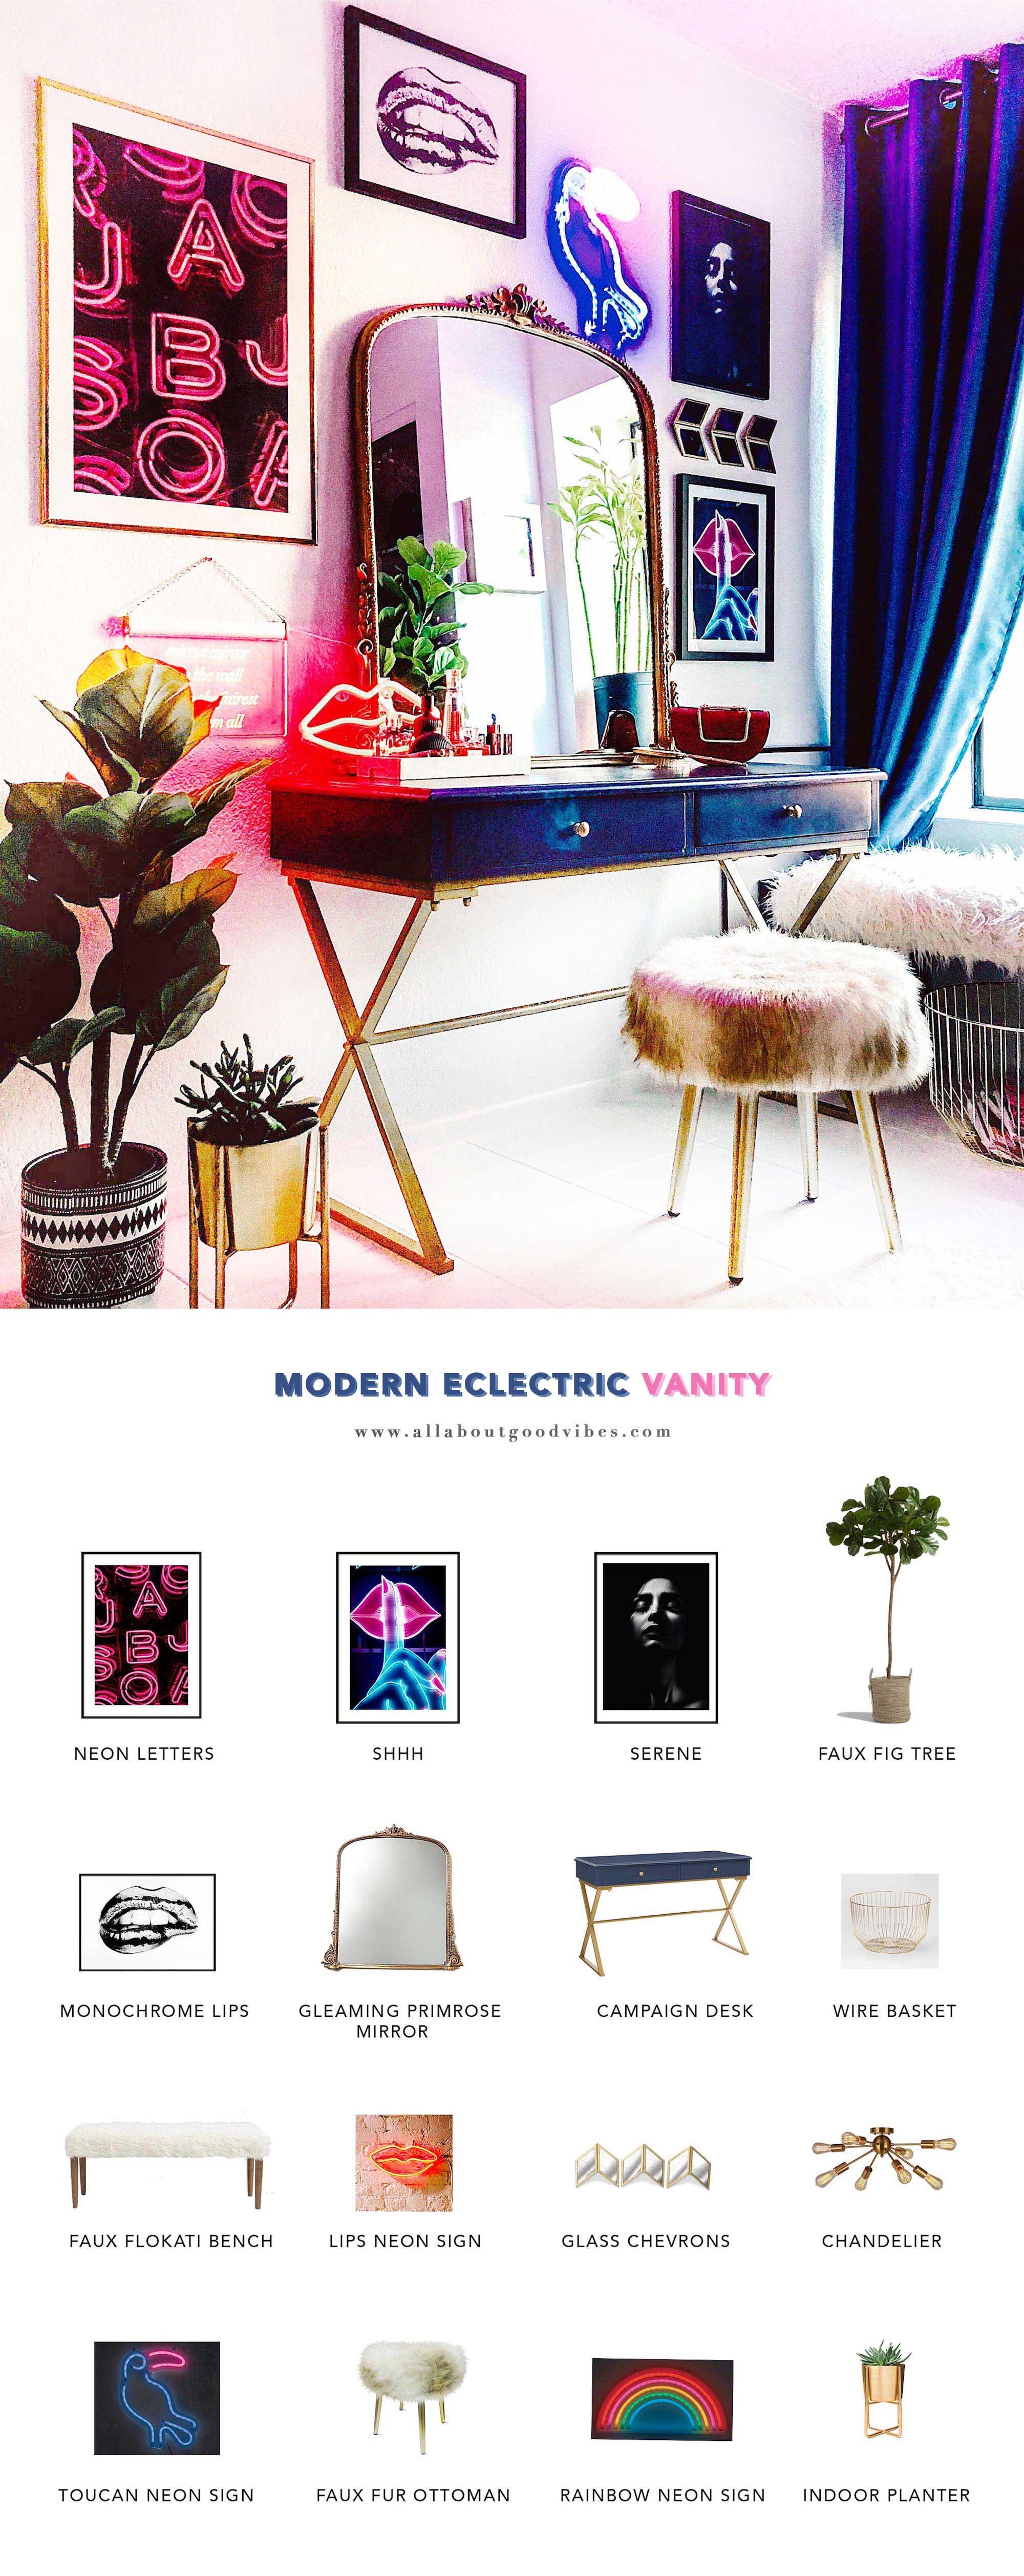 makeup-vanity-get the look Modern Eclectic Vanity with Desenio   Free Phone and Desktop wallpapers download